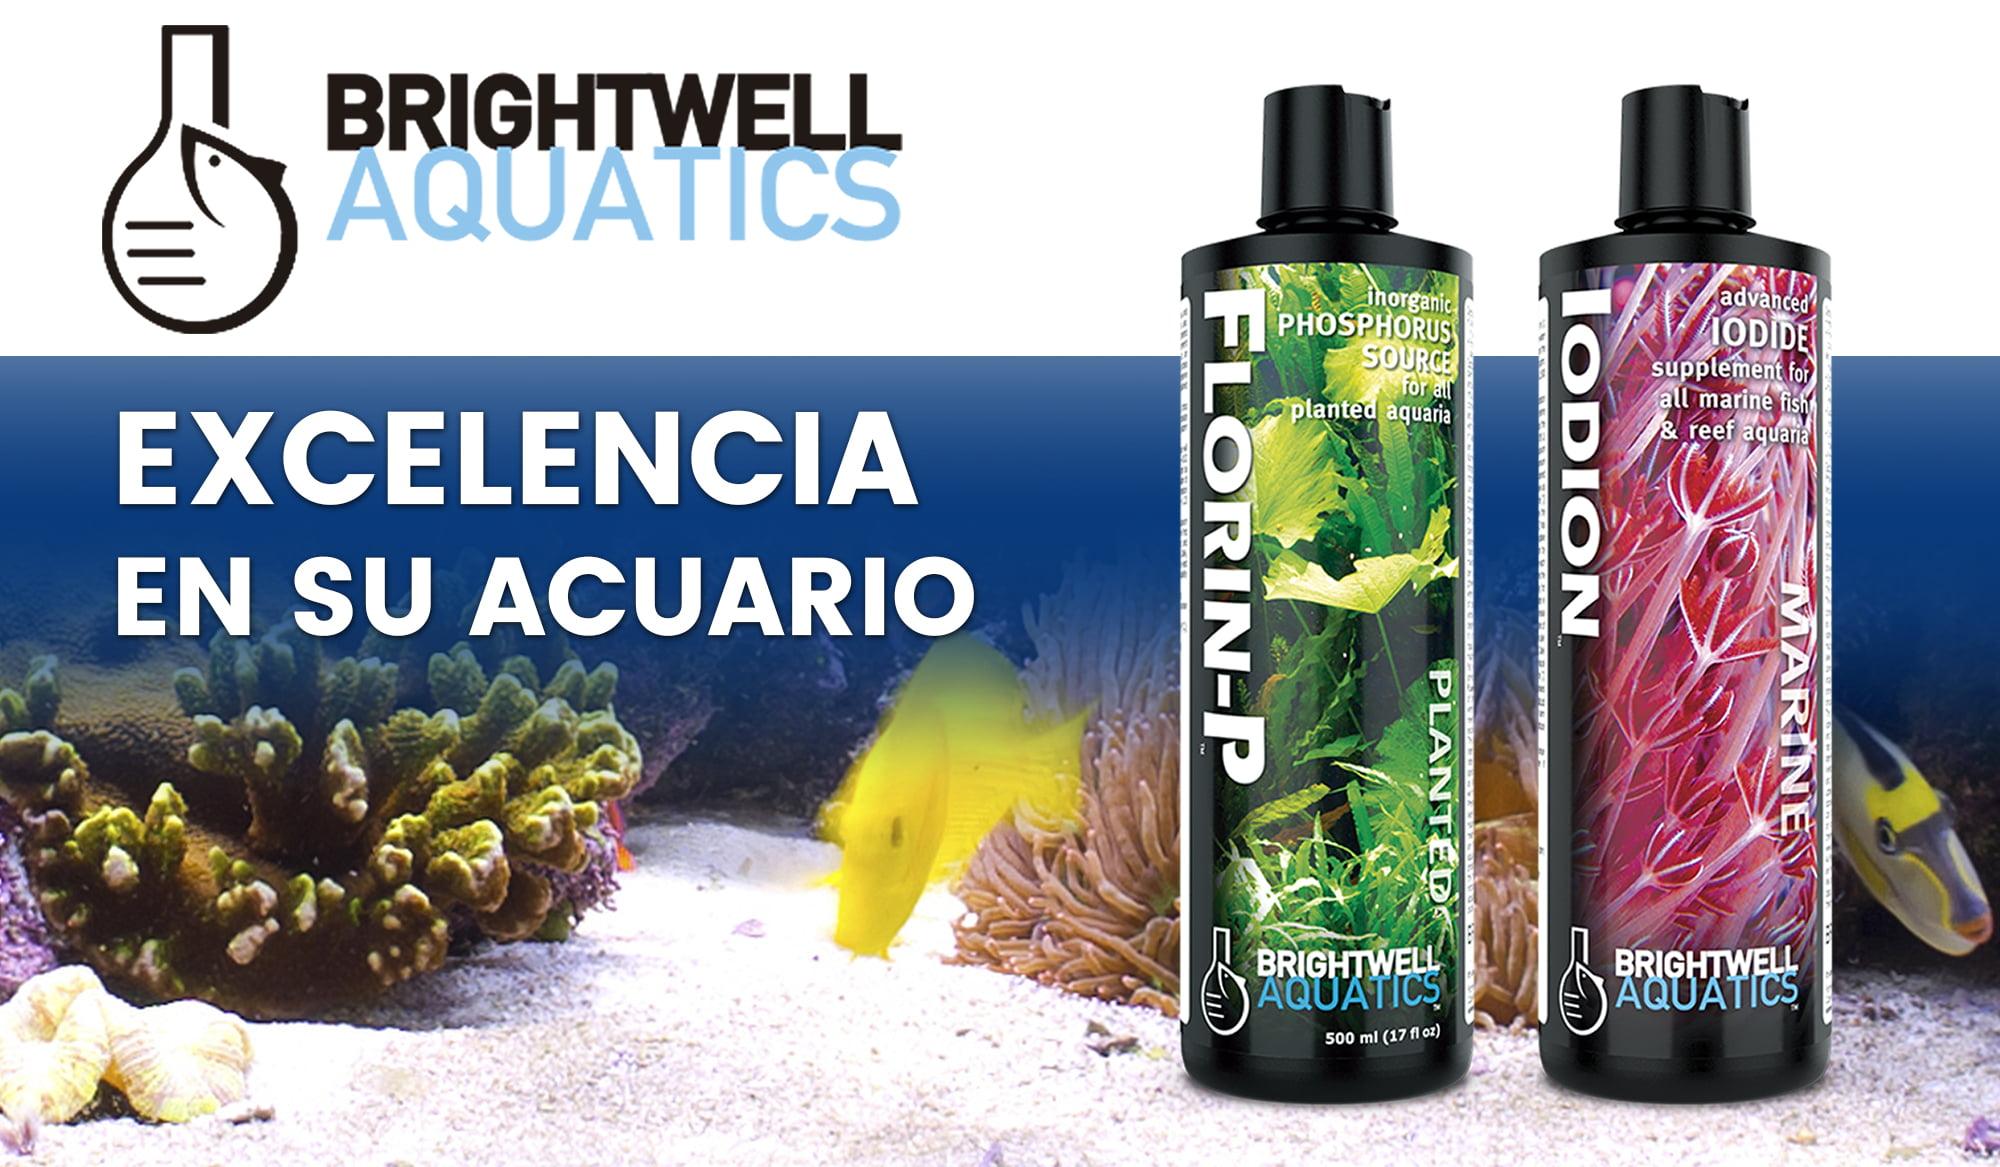 Brightwell Aquatics, calidad superior para acuarios